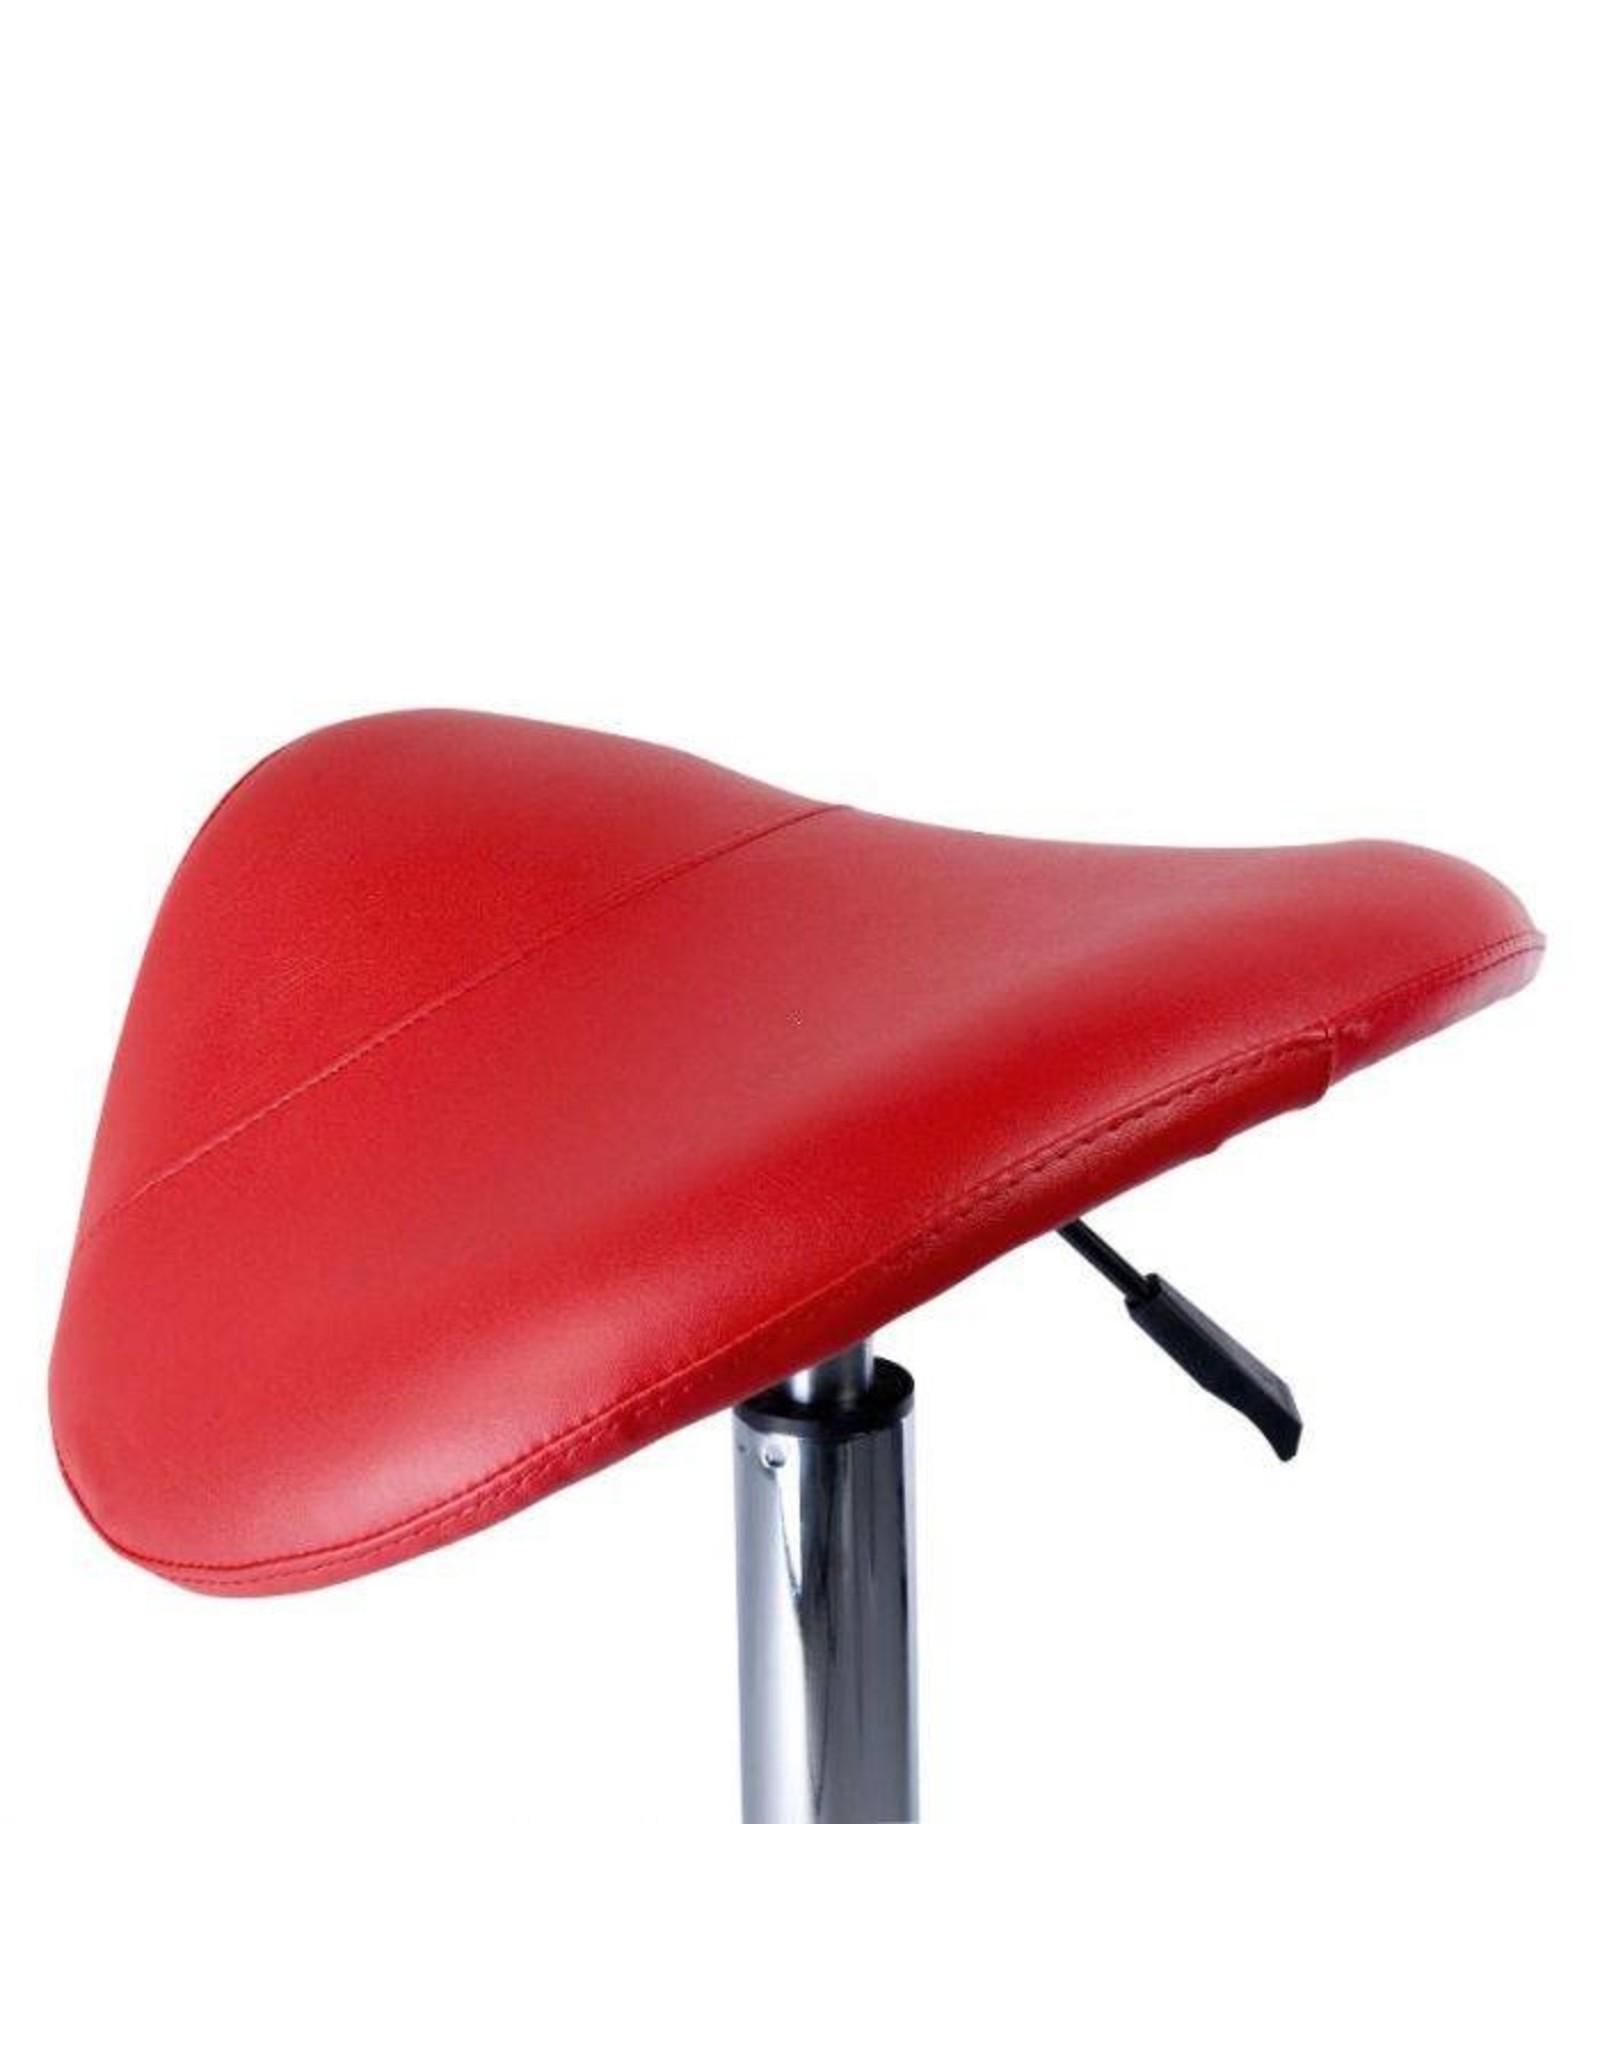 Merkloos Zadelkruk Hydraulische - rood